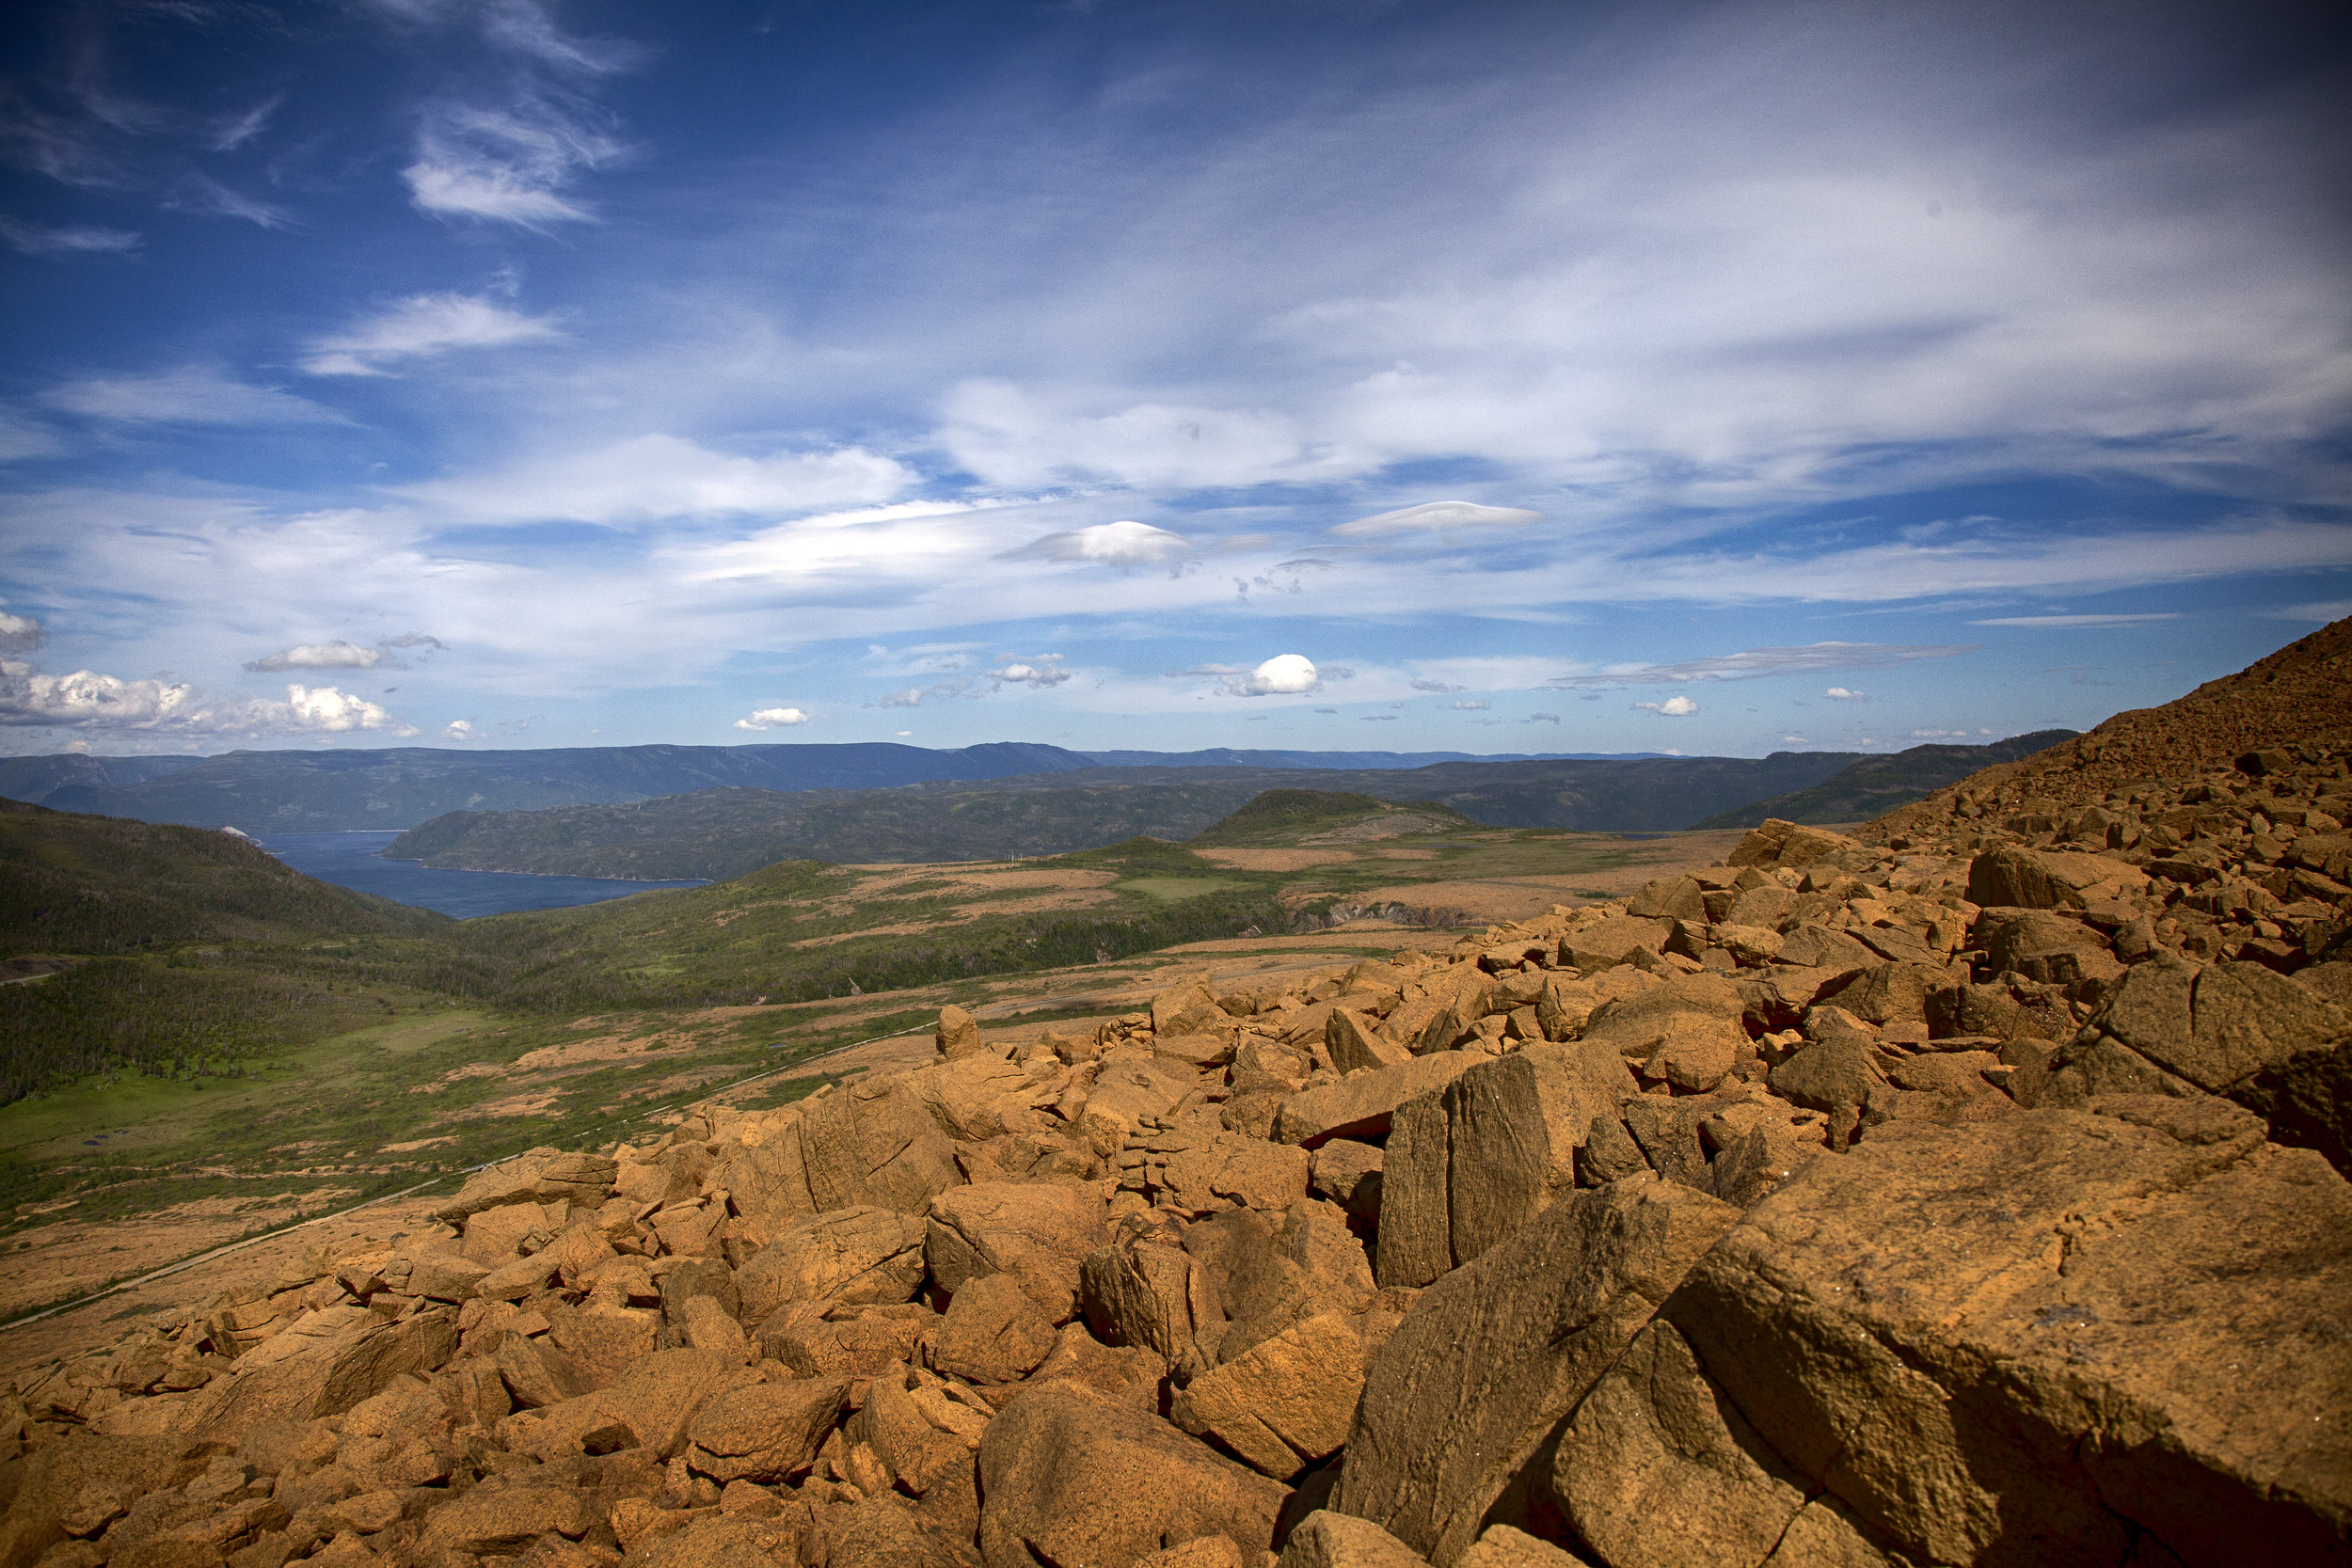 ros Morne National Park - Across the Blue Planet